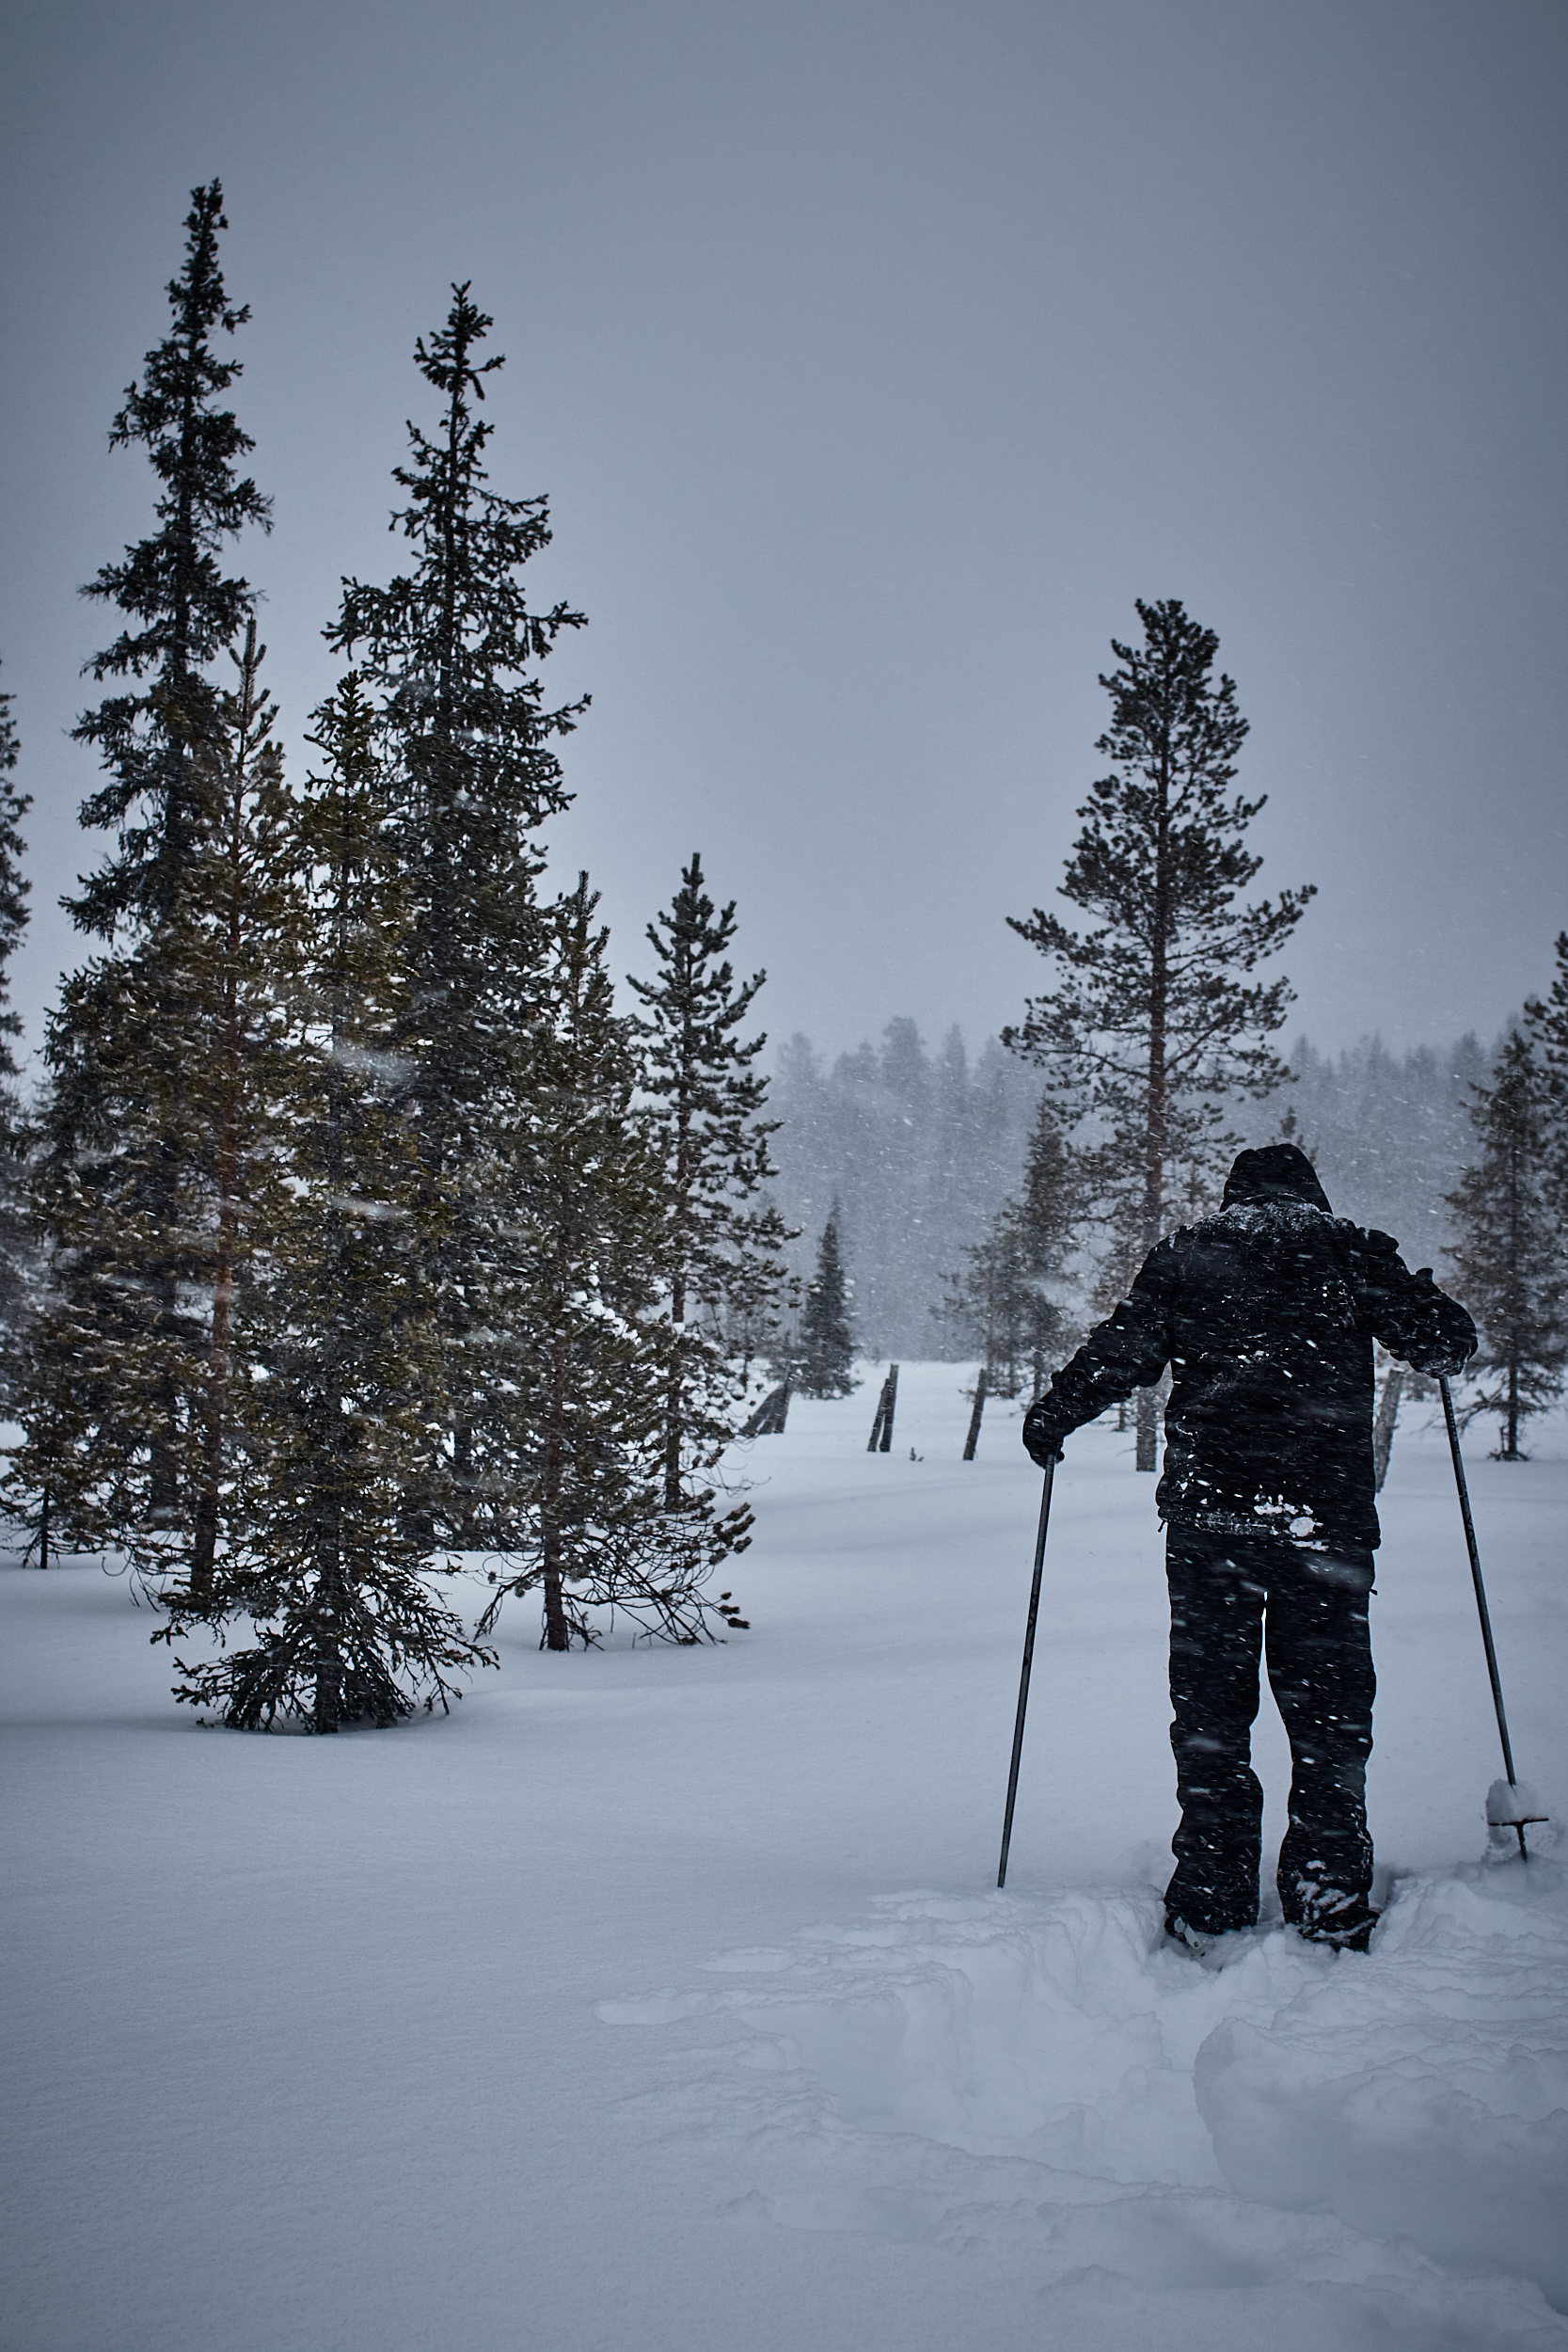 35 mm - 2019-03-09 16.43.48 - Oulu Marvin Timo.jpg